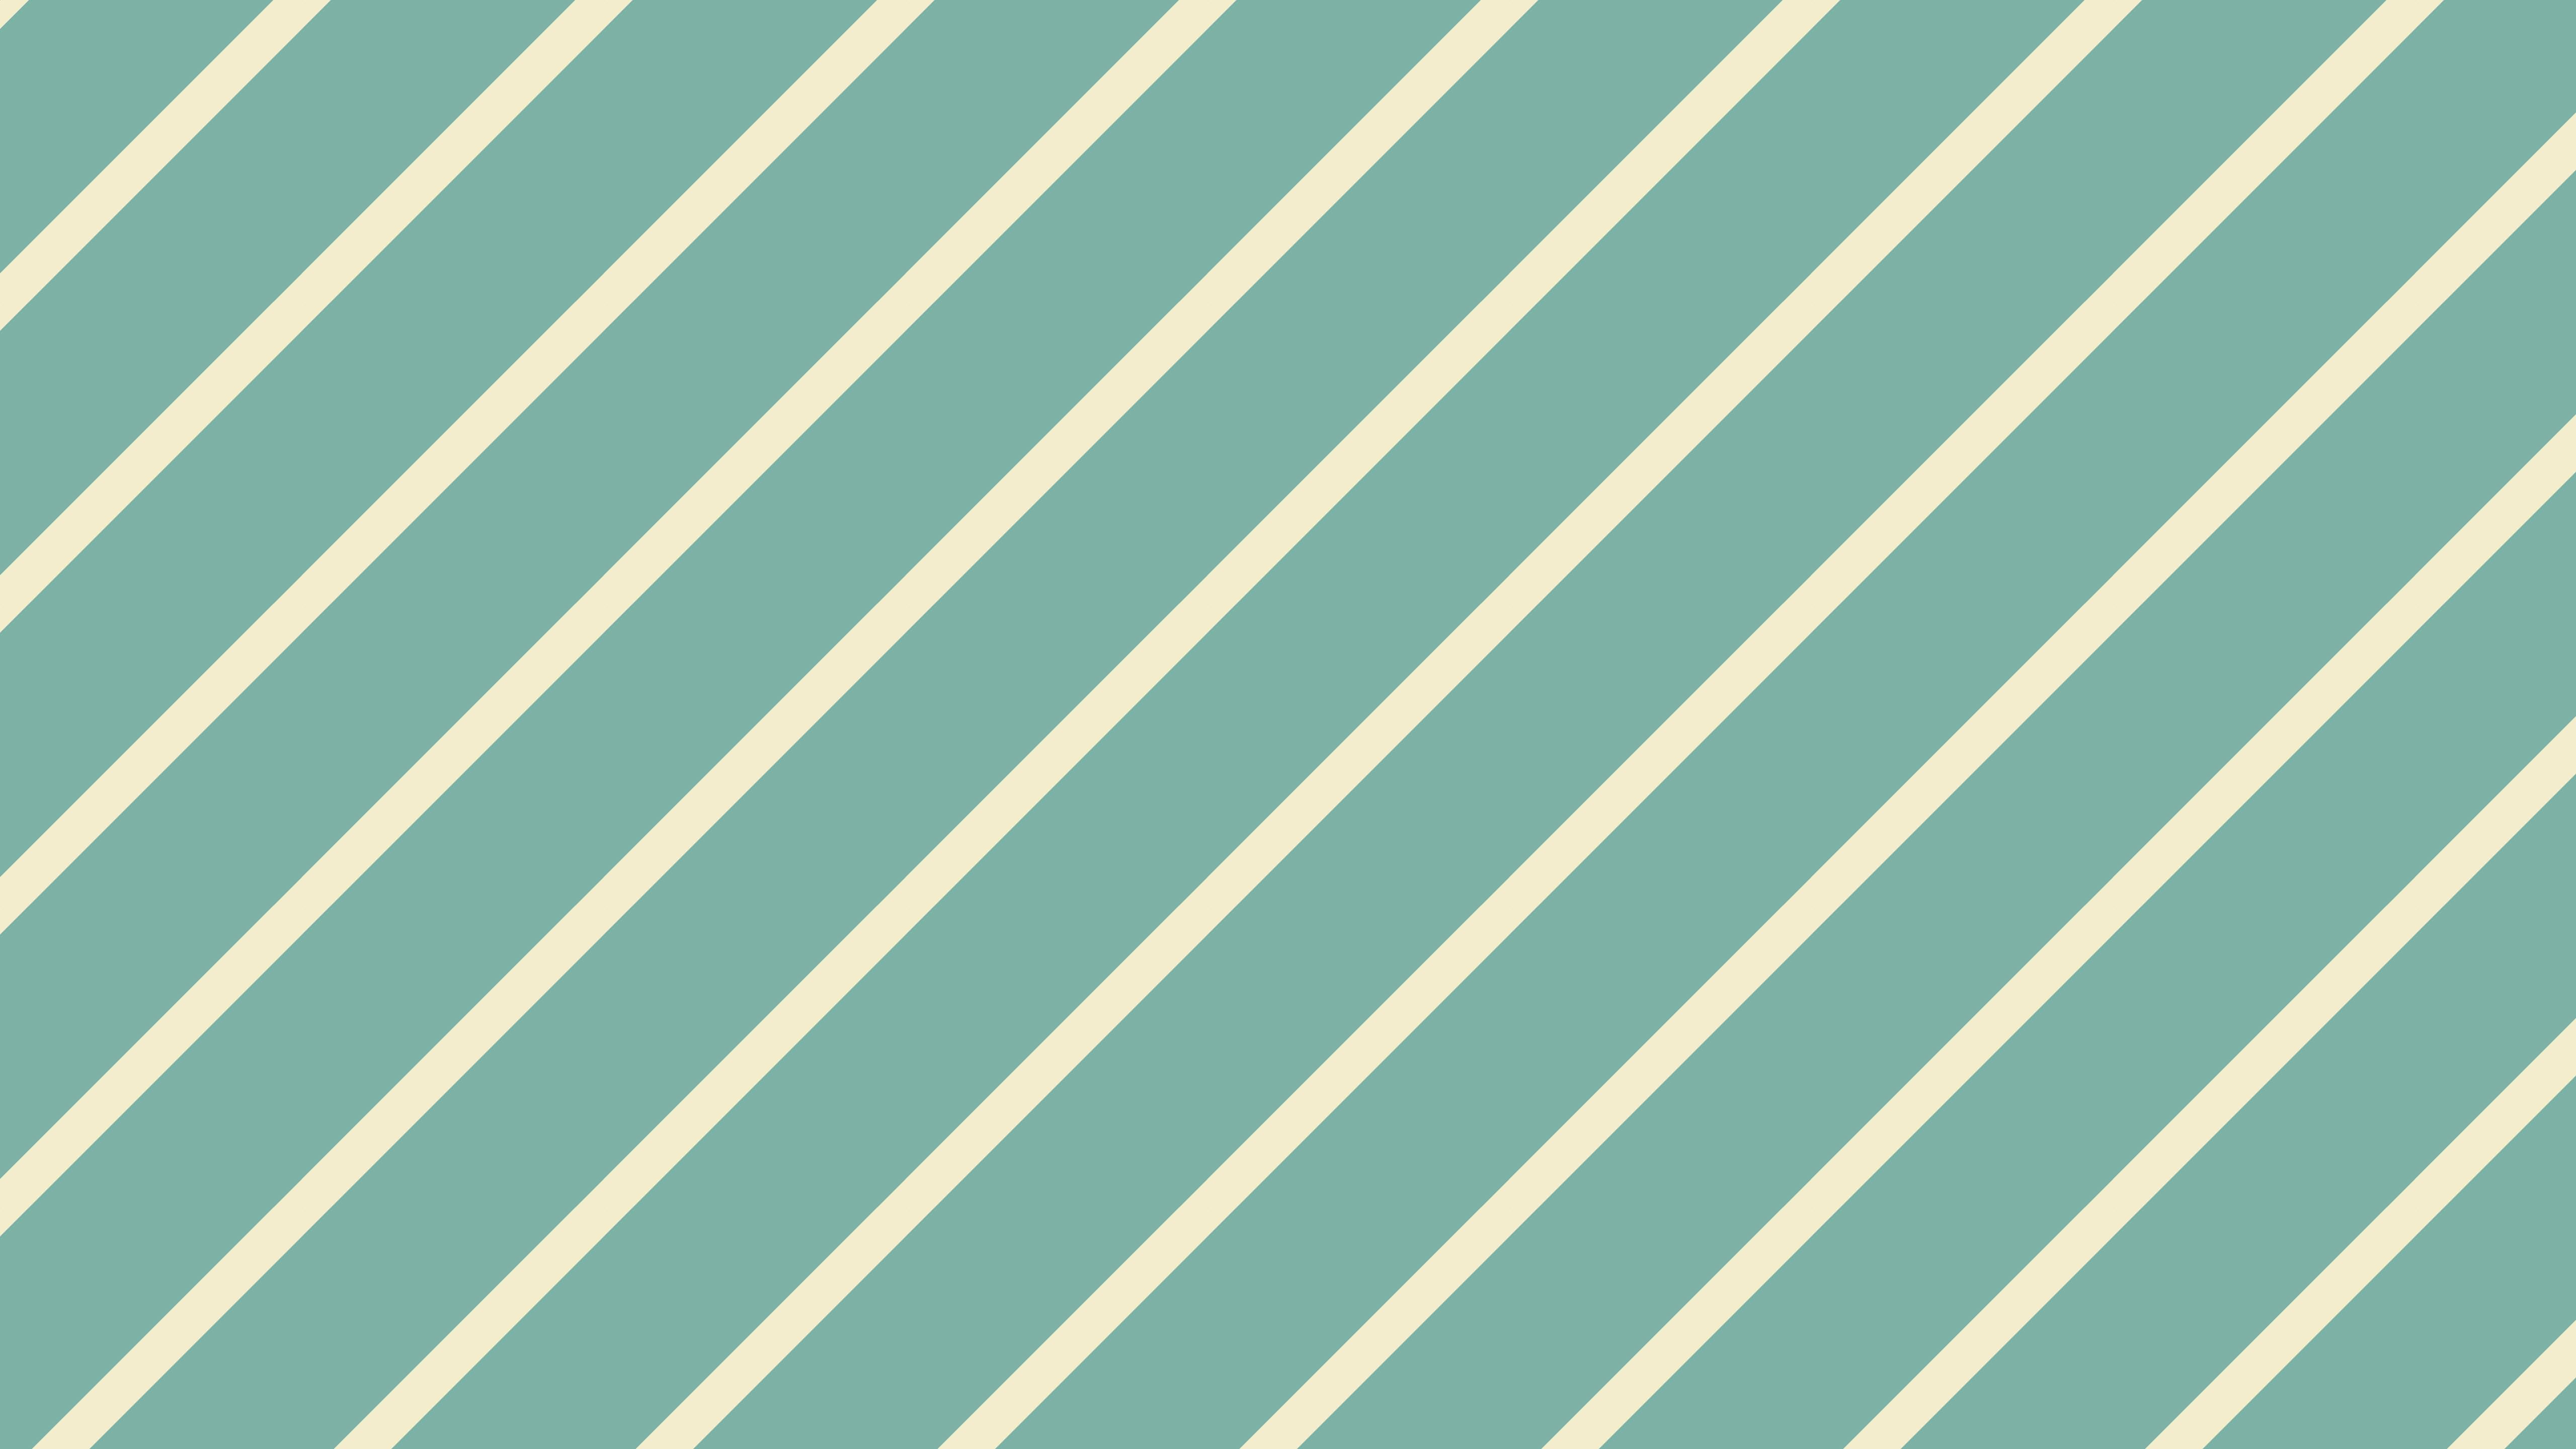 wallpaper garis,aqua,turquoise,line,green,pattern,teal,yellow ...